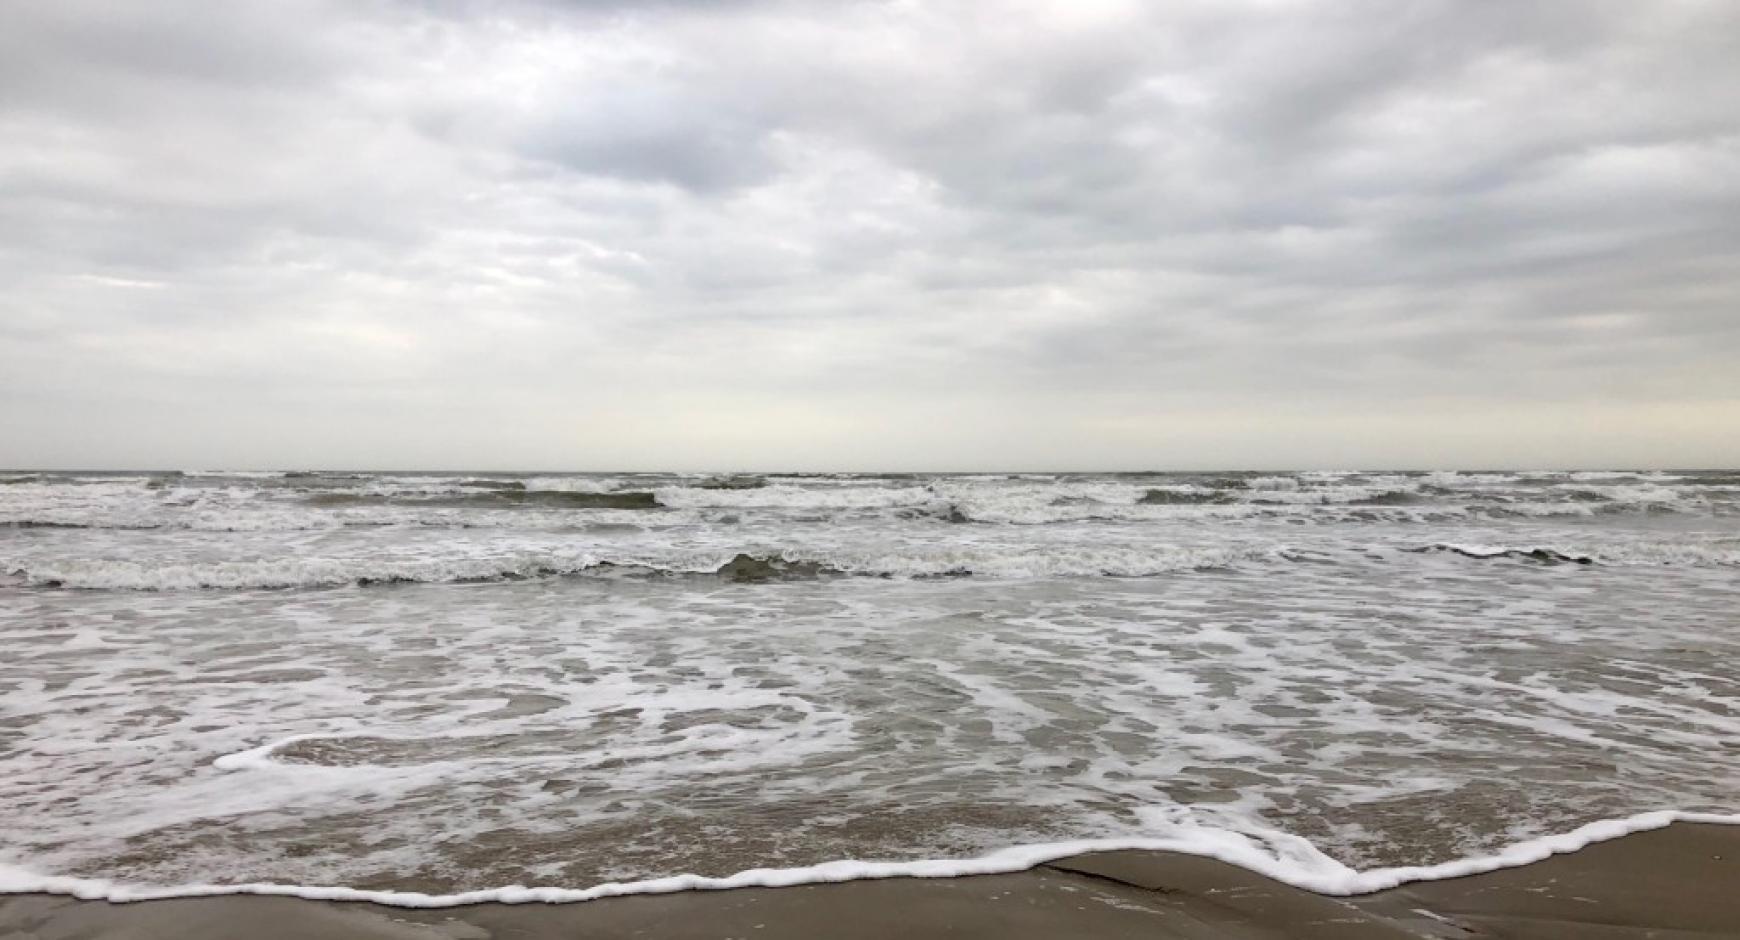 The beach at Port Aransas.